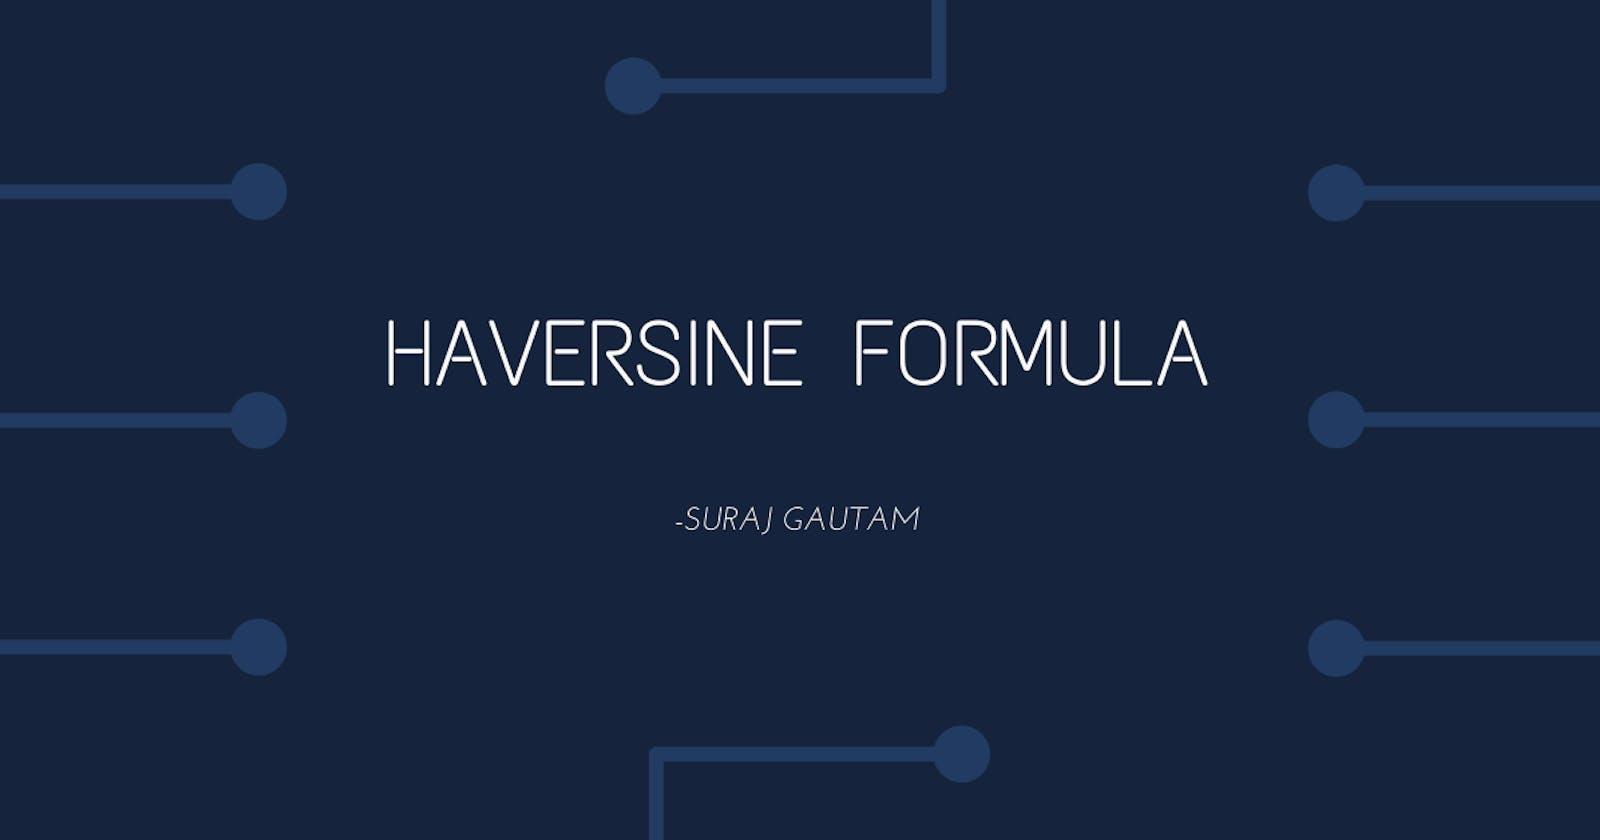 Haversine Formula for Spring Data JPA